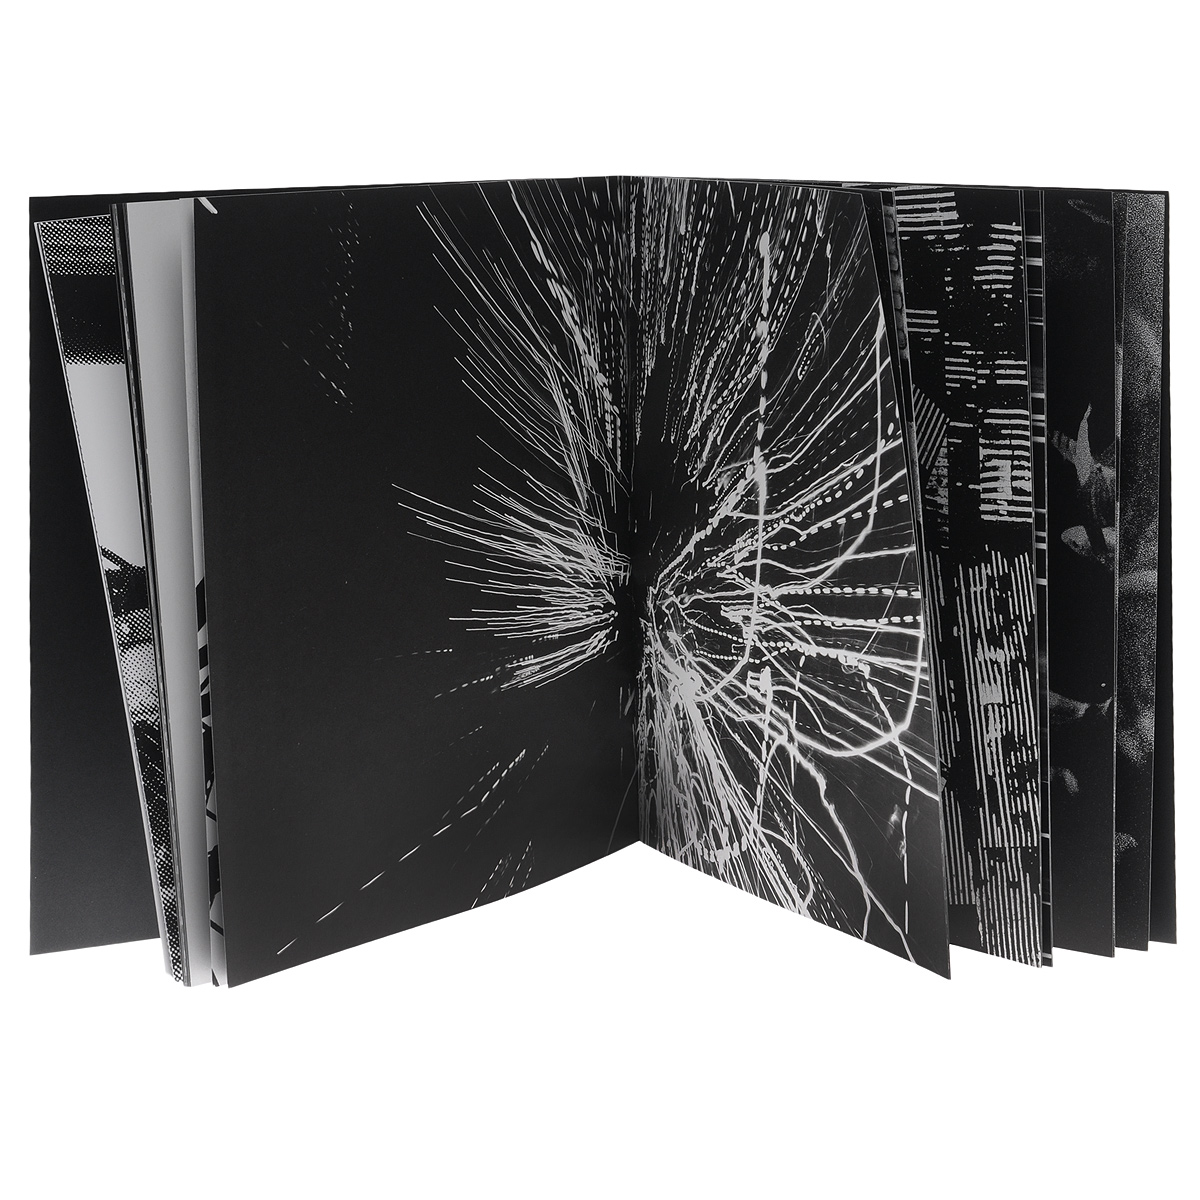 Underworld.  Dubnobasswithmyheadman (5 CD) ООО